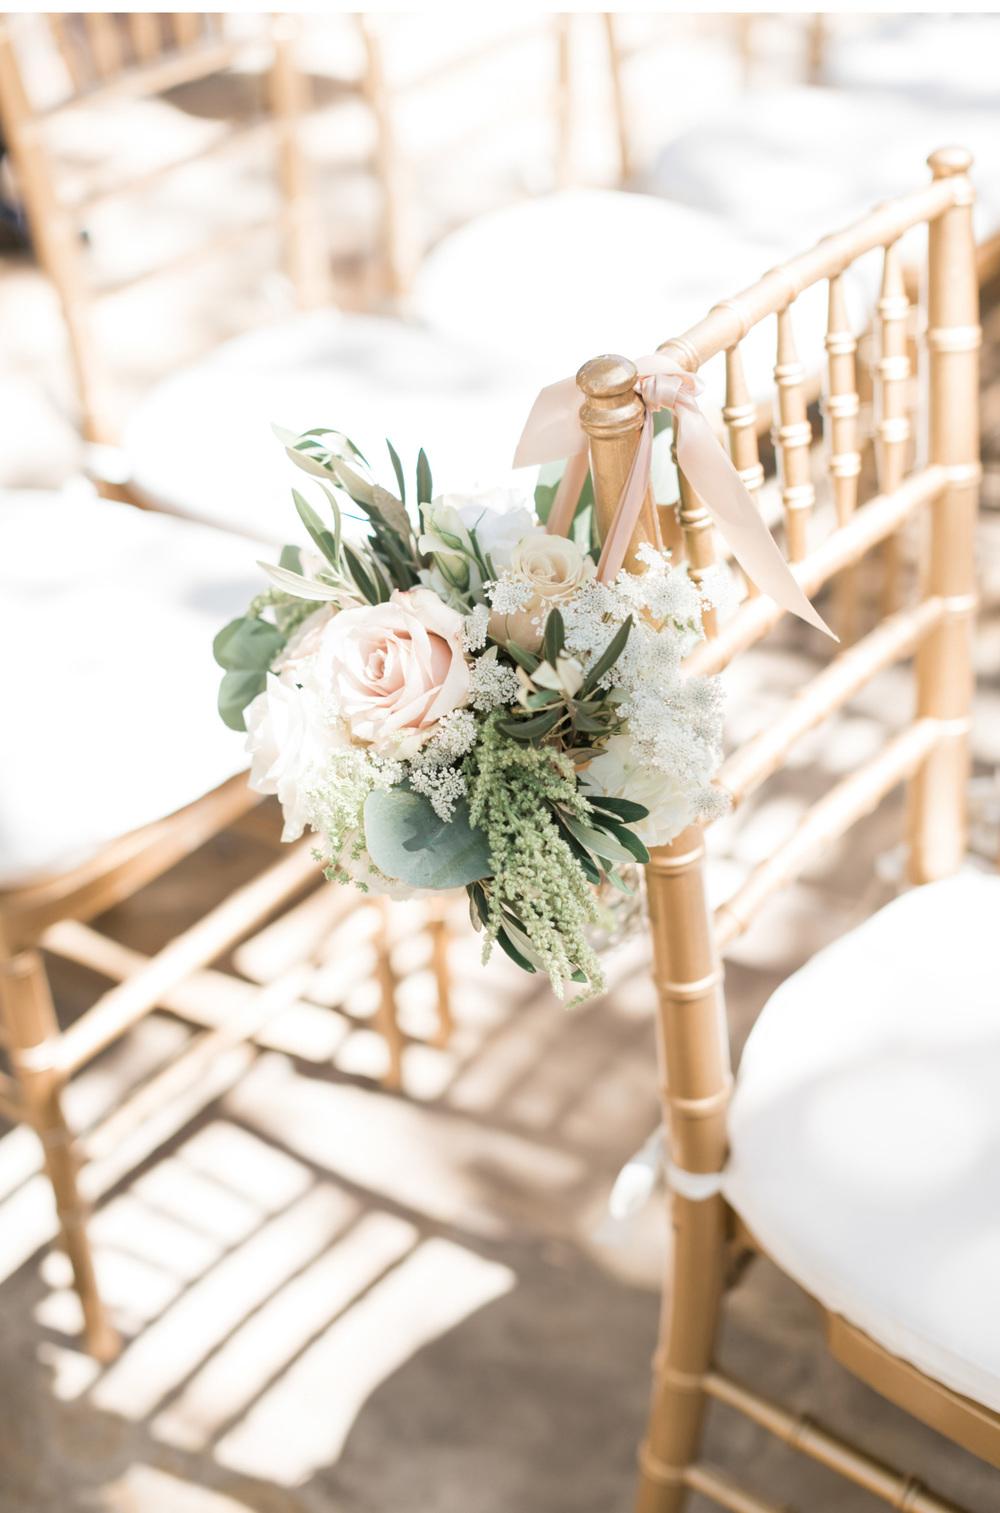 San-Juan-Capistrano-Wedding-Style-Me-Pretty-Natalie-Schutt-Photography_04.jpg